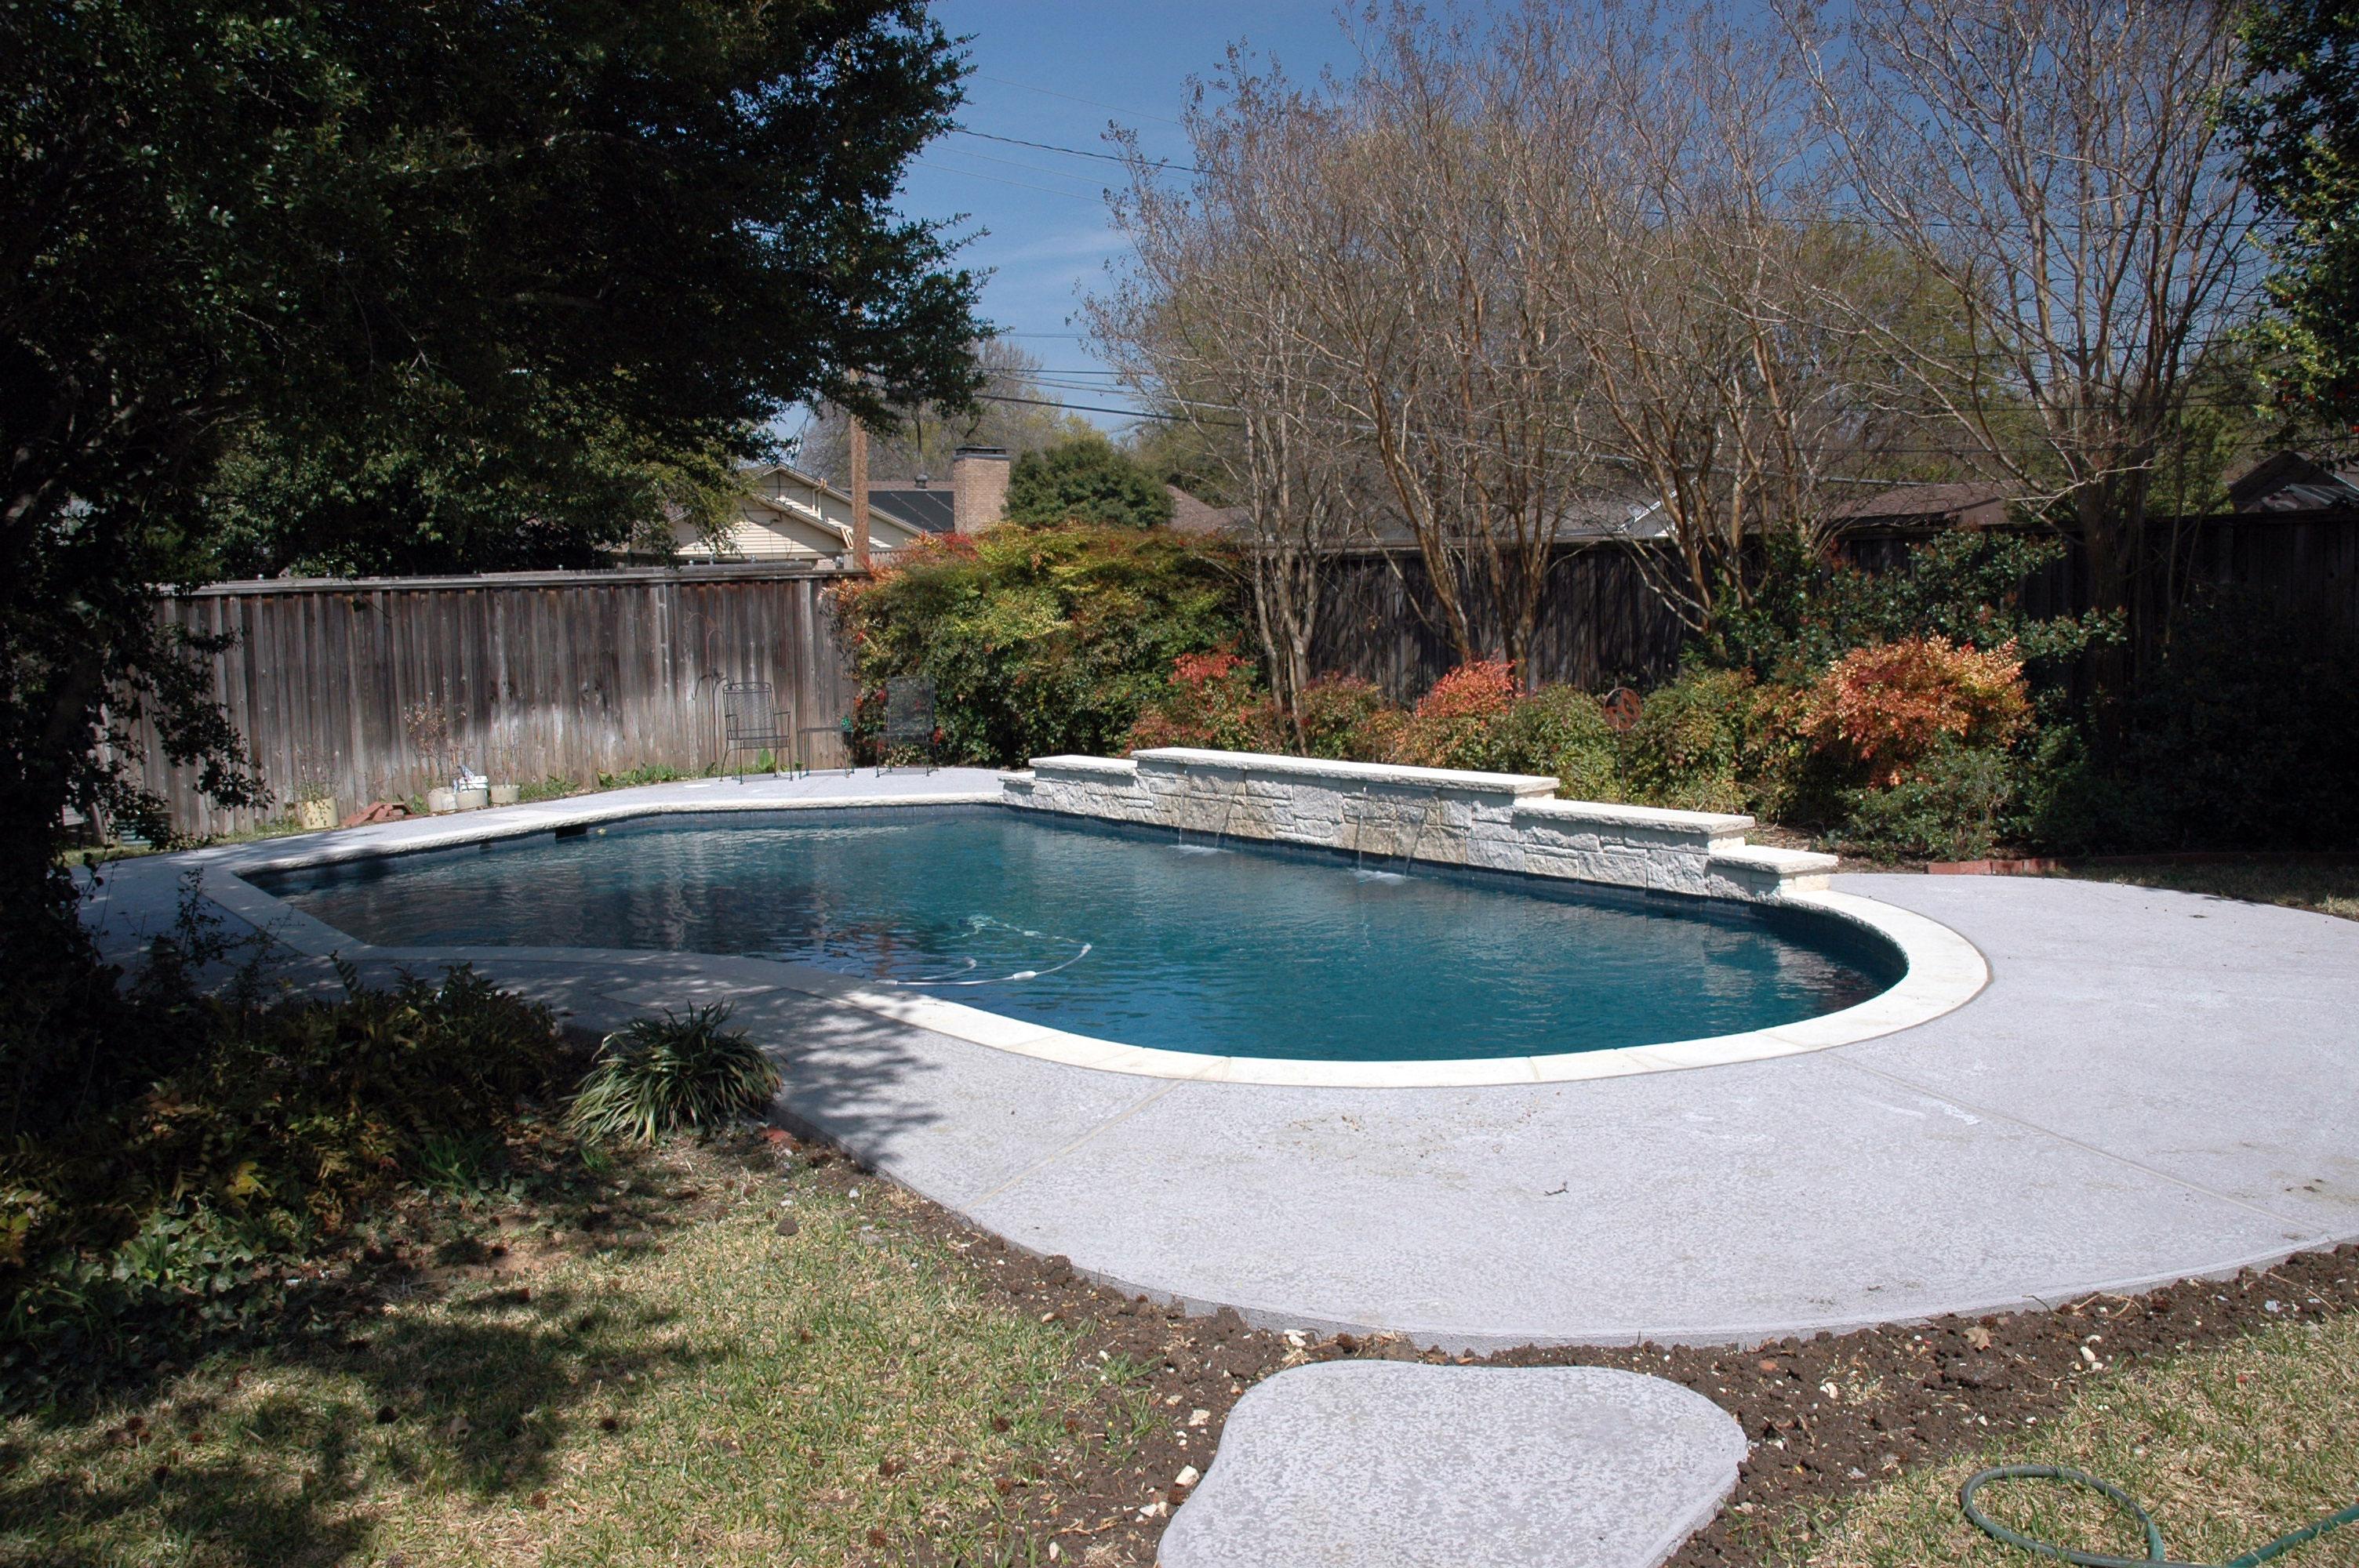 Pool 96